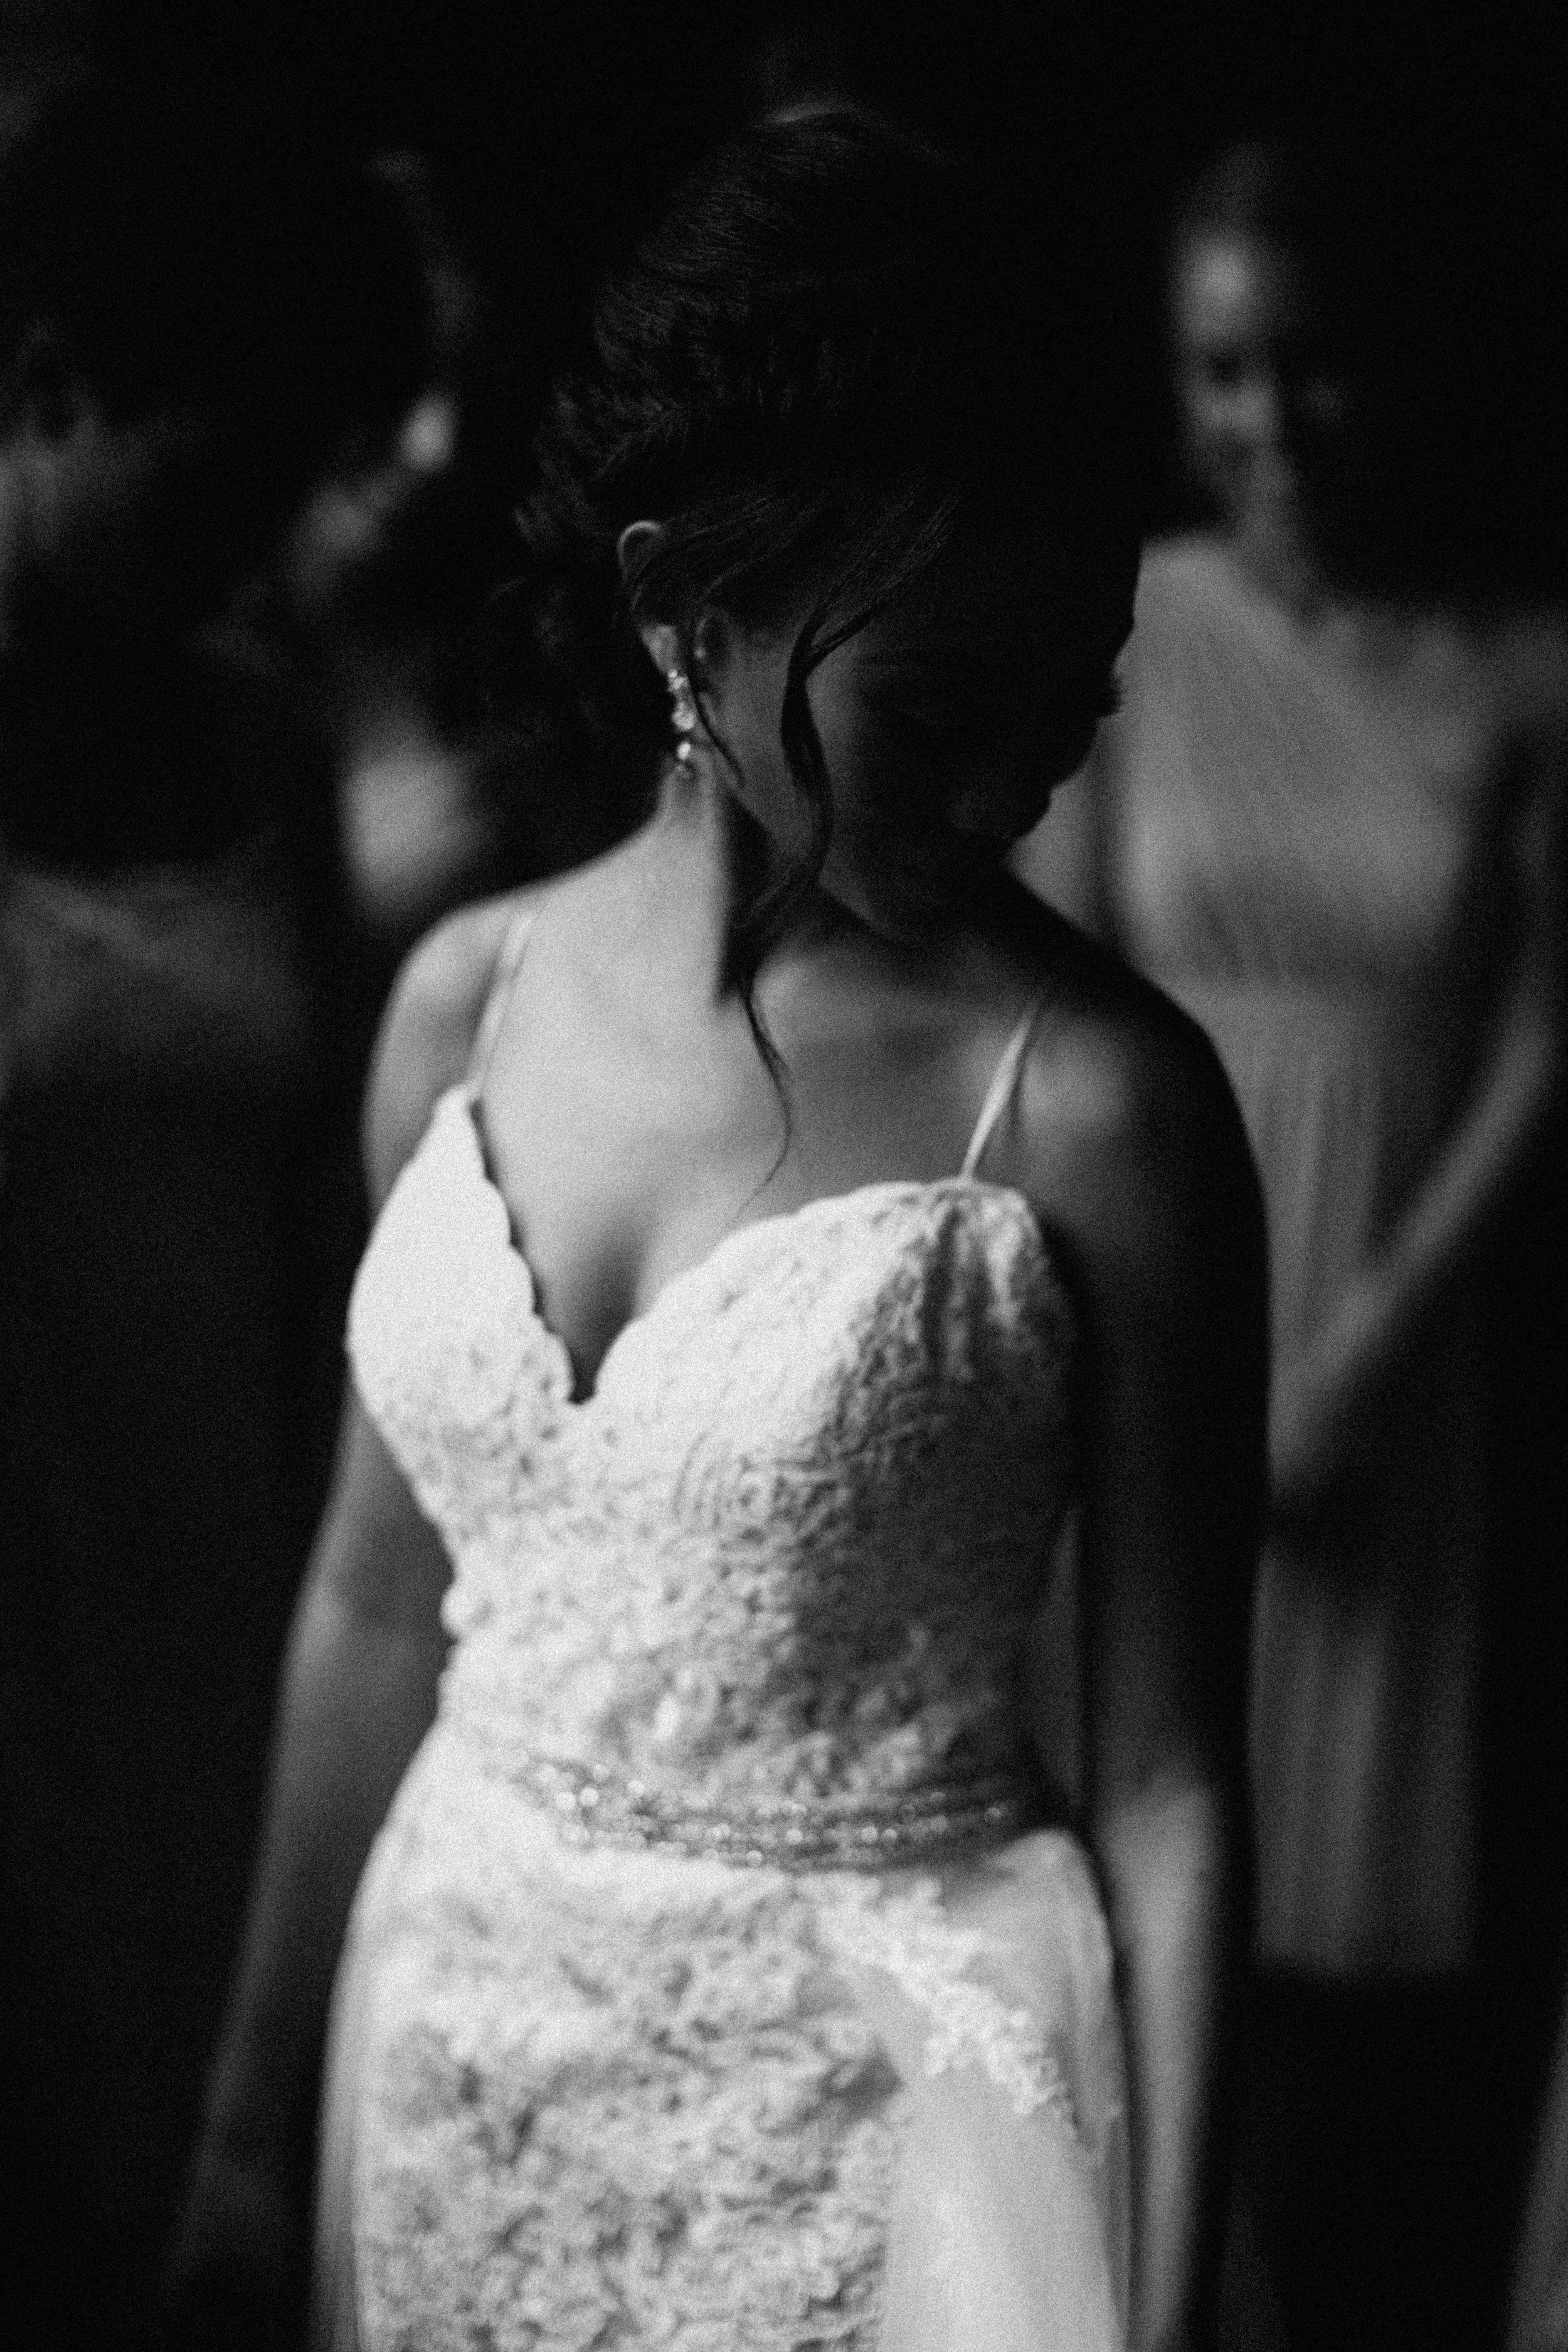 king_plow_atlanta_wedding_art_gallery_modern_lifestyle_documentary_1143.jpg